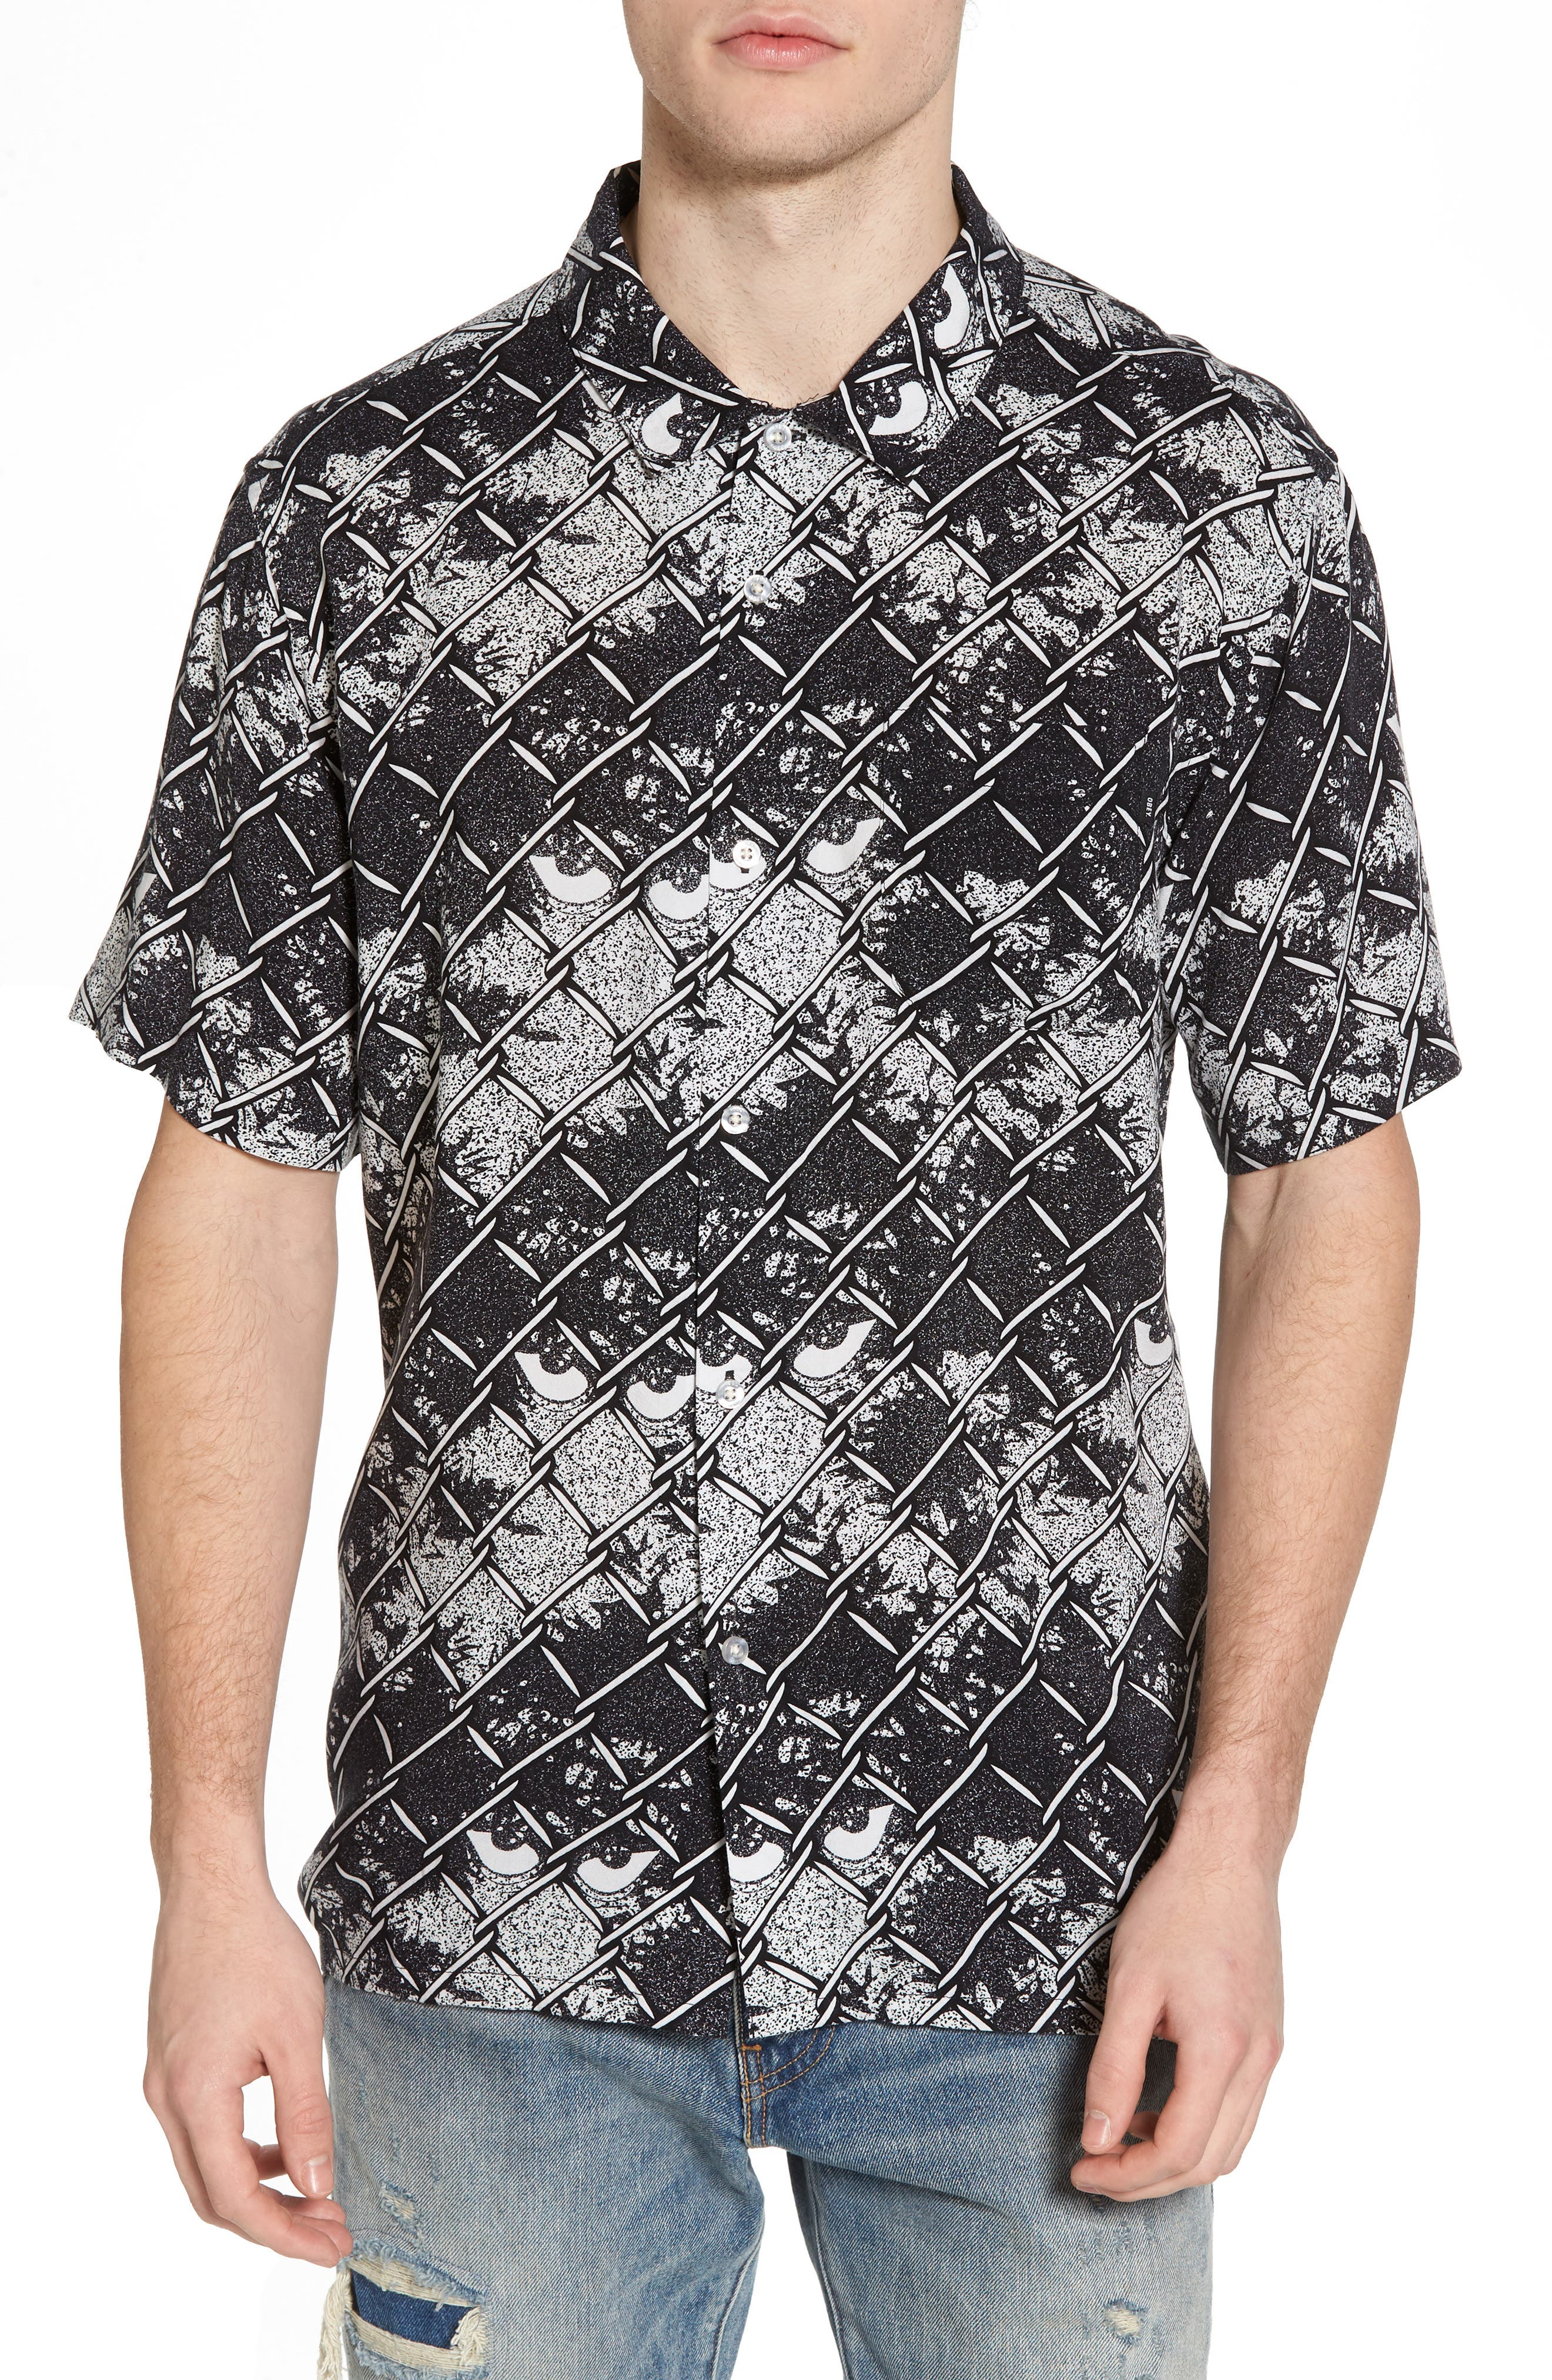 Gatekeeper Short Sleeve Shirt,                             Main thumbnail 1, color,                             Black Multi